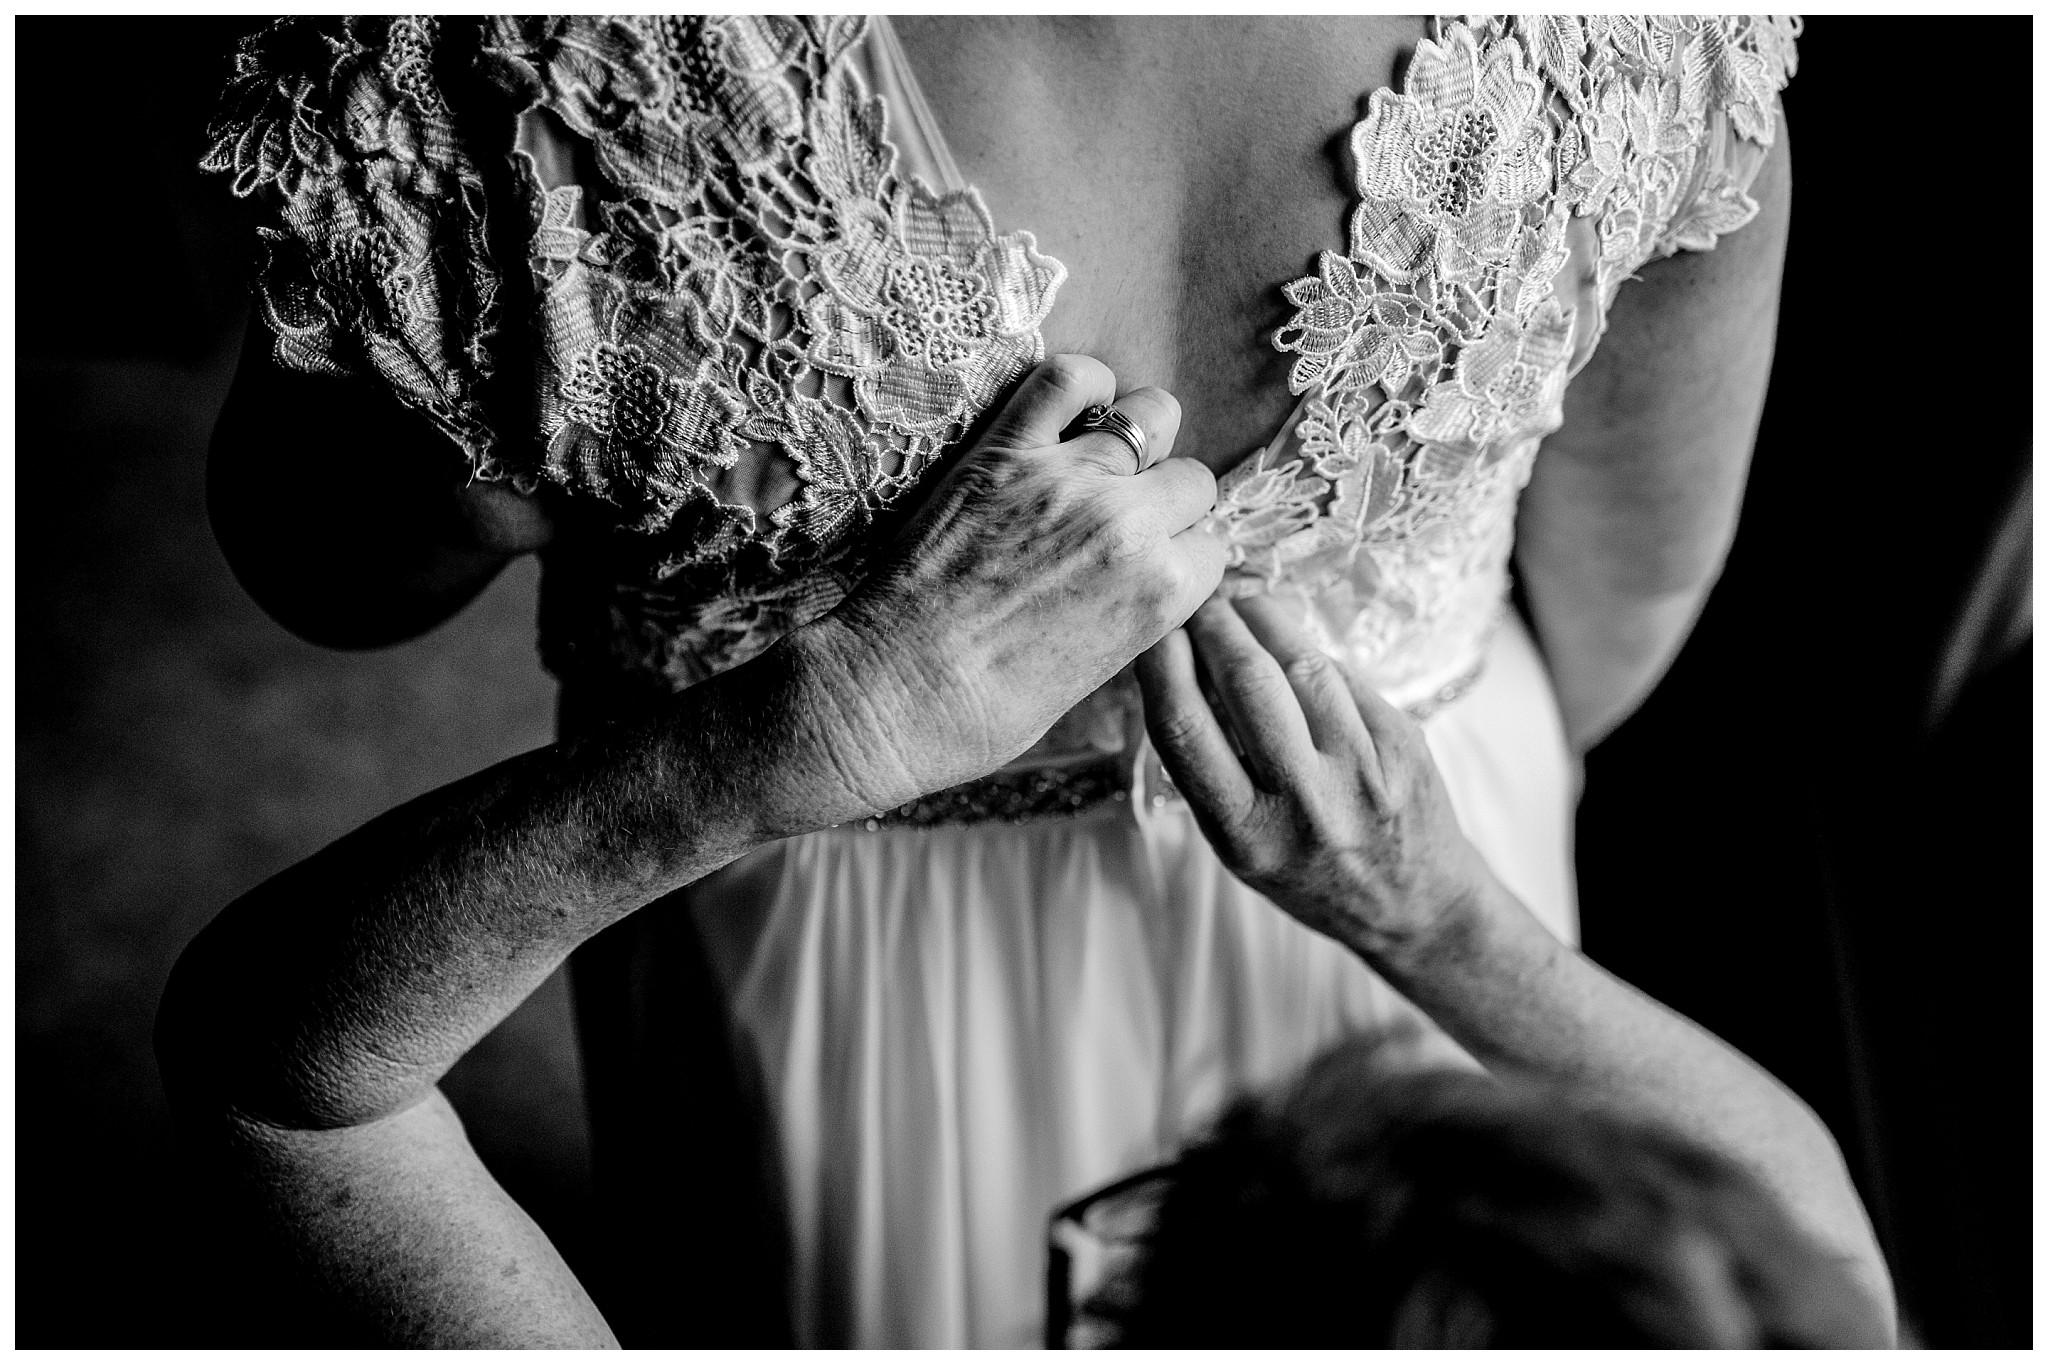 Aldergrove Park Fall Backyard Wedding Photographer Pregnant Bride Tent Outdoor BC Canada Best Wedding Photographer_0006.jpg